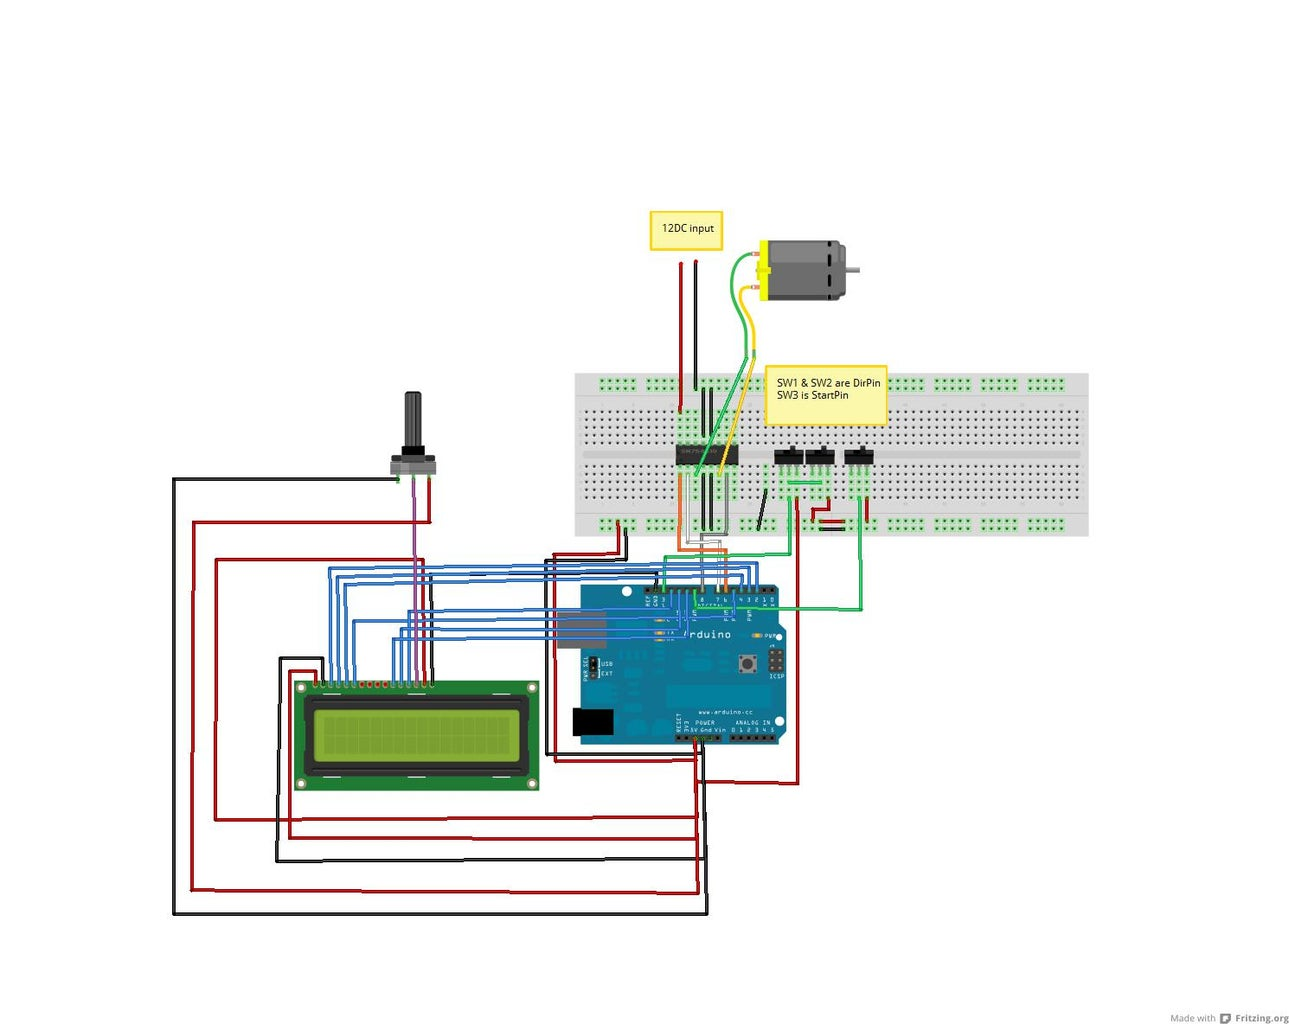 Part 3: Programing and Circuit Design